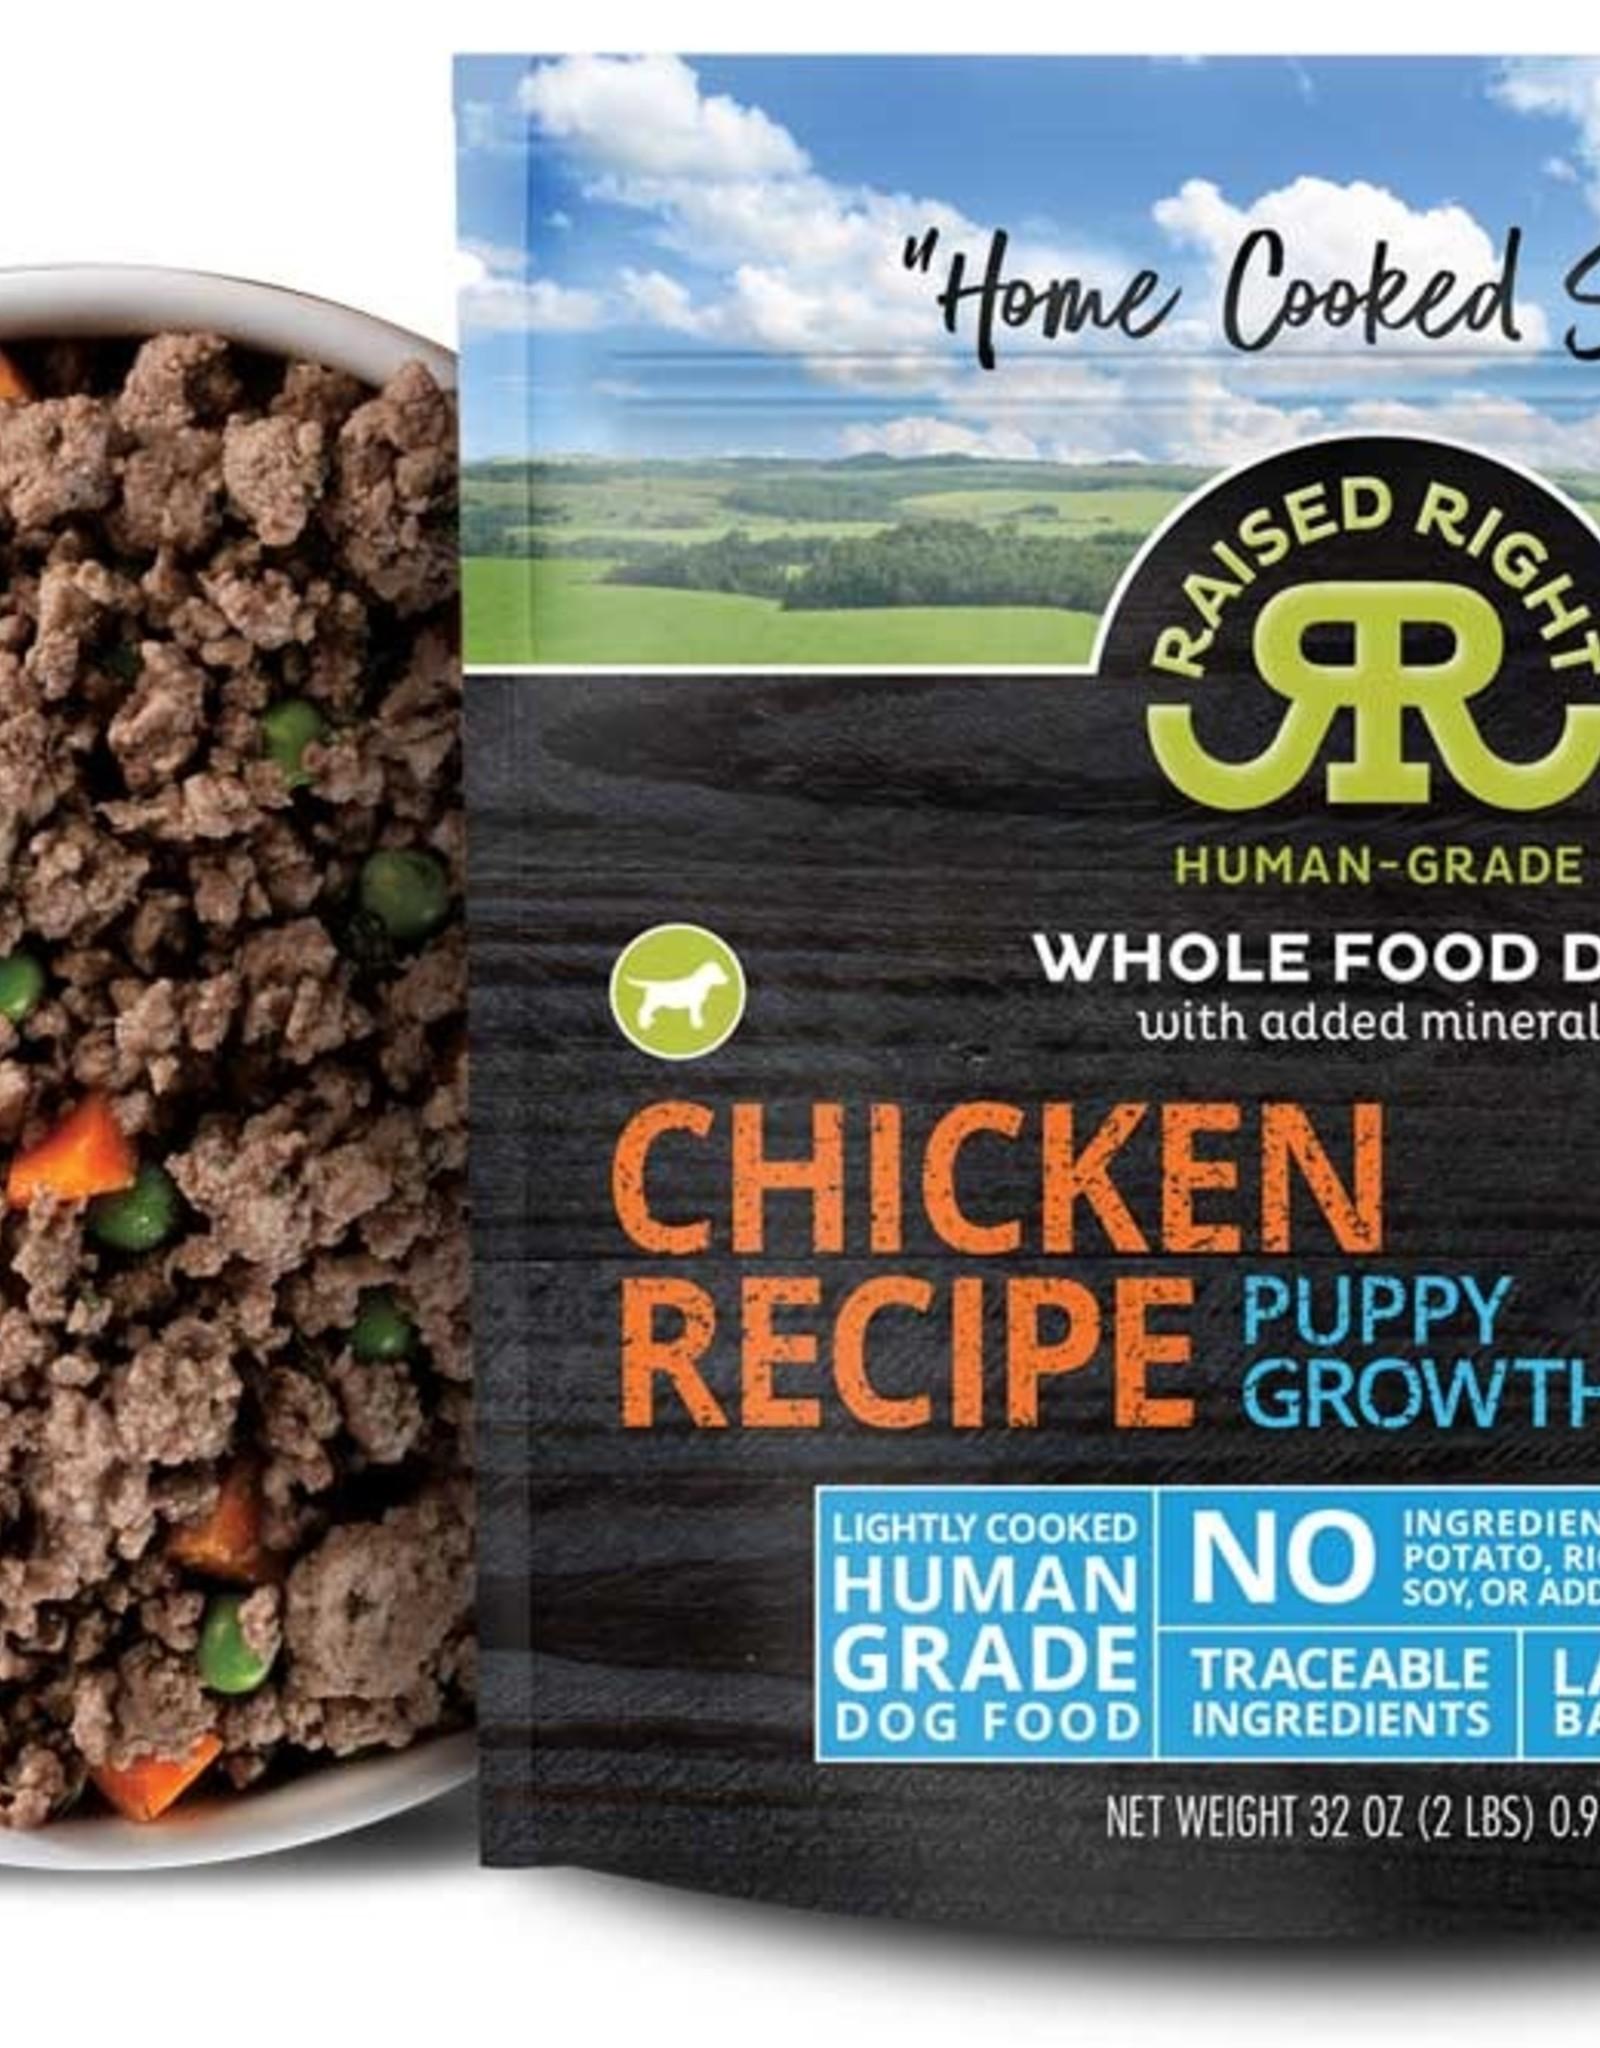 Raised Right Raised Right Chicken Puppy Growth Recipe